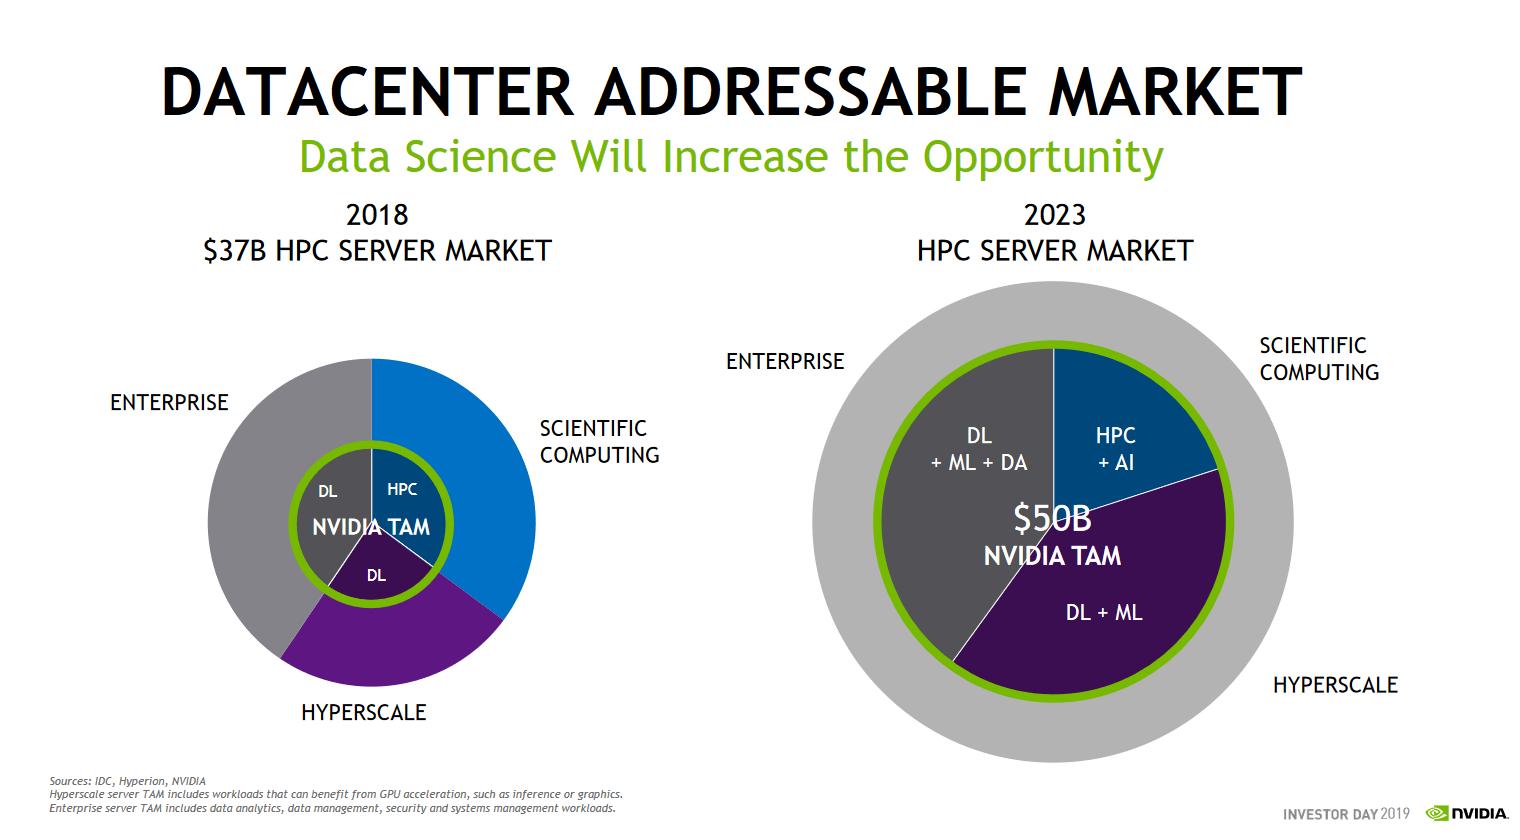 Who Will Win the Next Enterprise Market? - Intel's Xeon